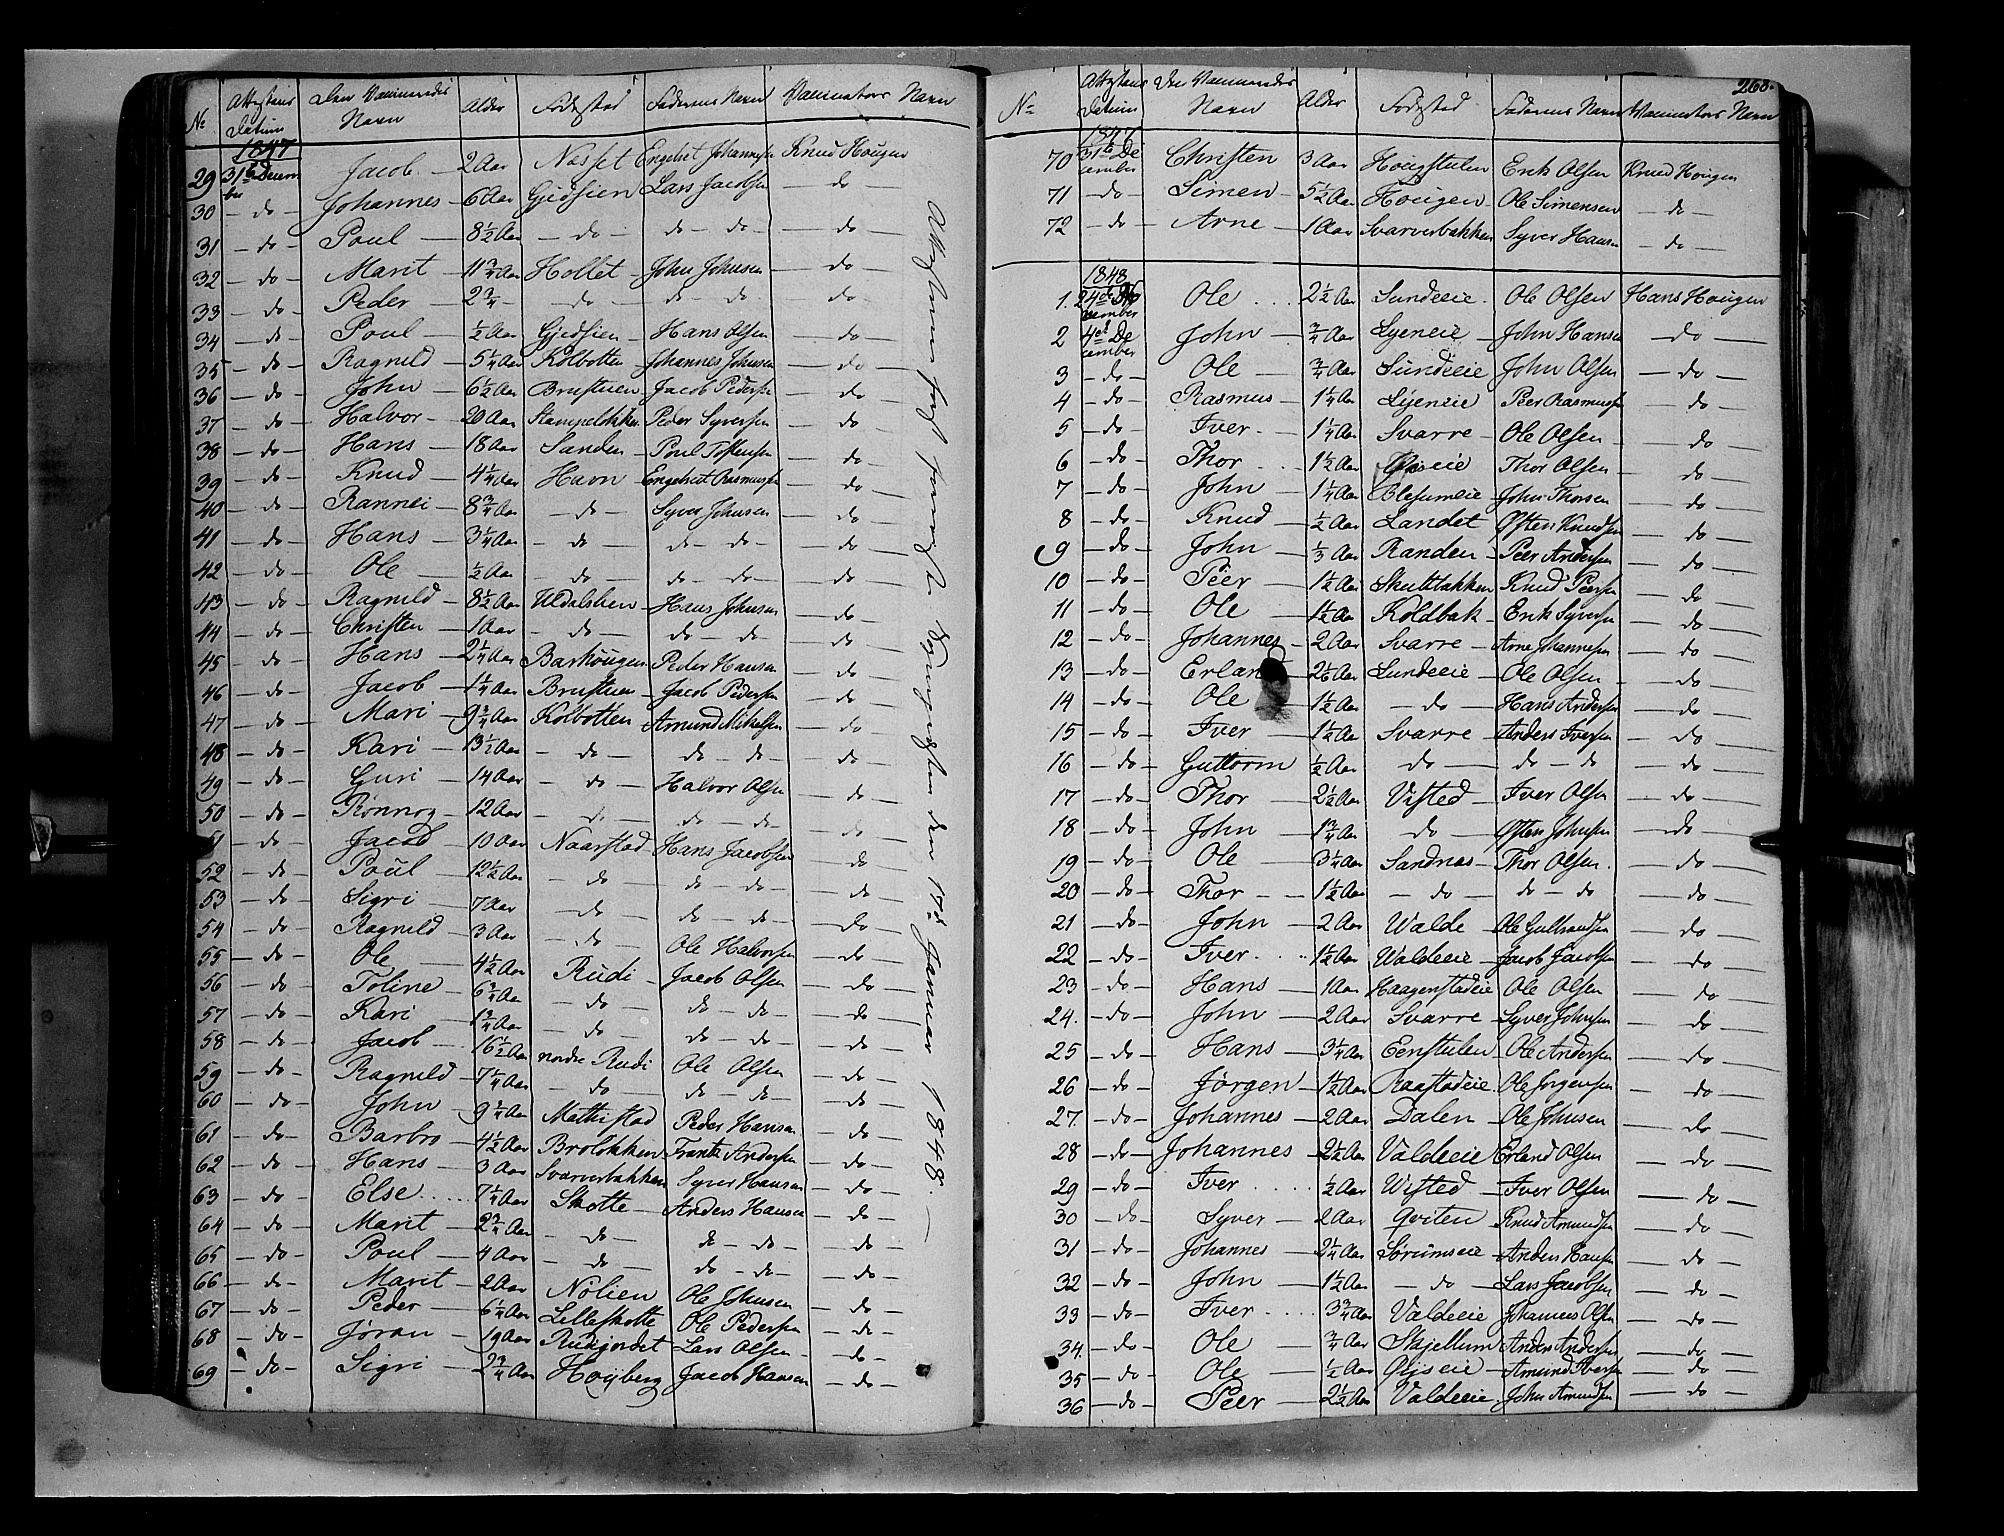 SAH, Vågå prestekontor, Ministerialbok nr. 5 /1, 1842-1856, s. 268